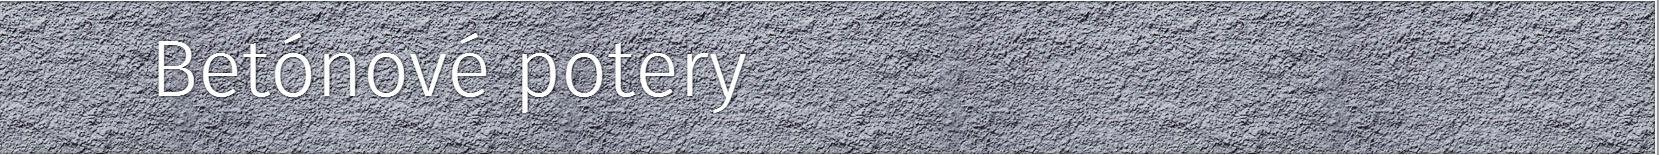 betonove potery